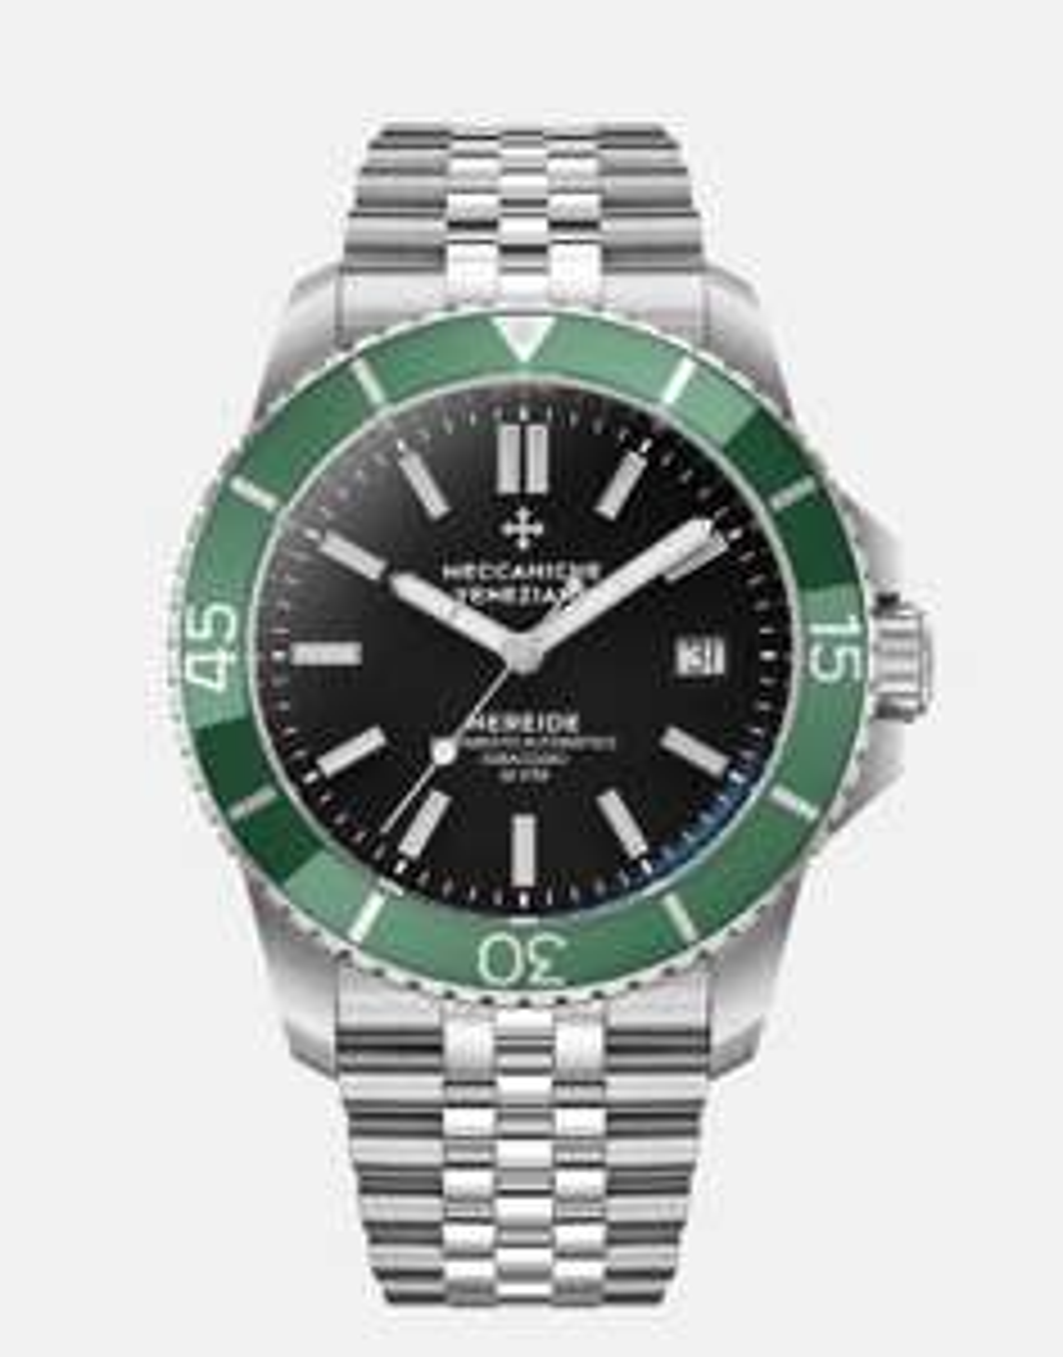 Meccaniche Veneziane - NEREIDE Ø42MM - Ginepro Watch of the Month - Uhr